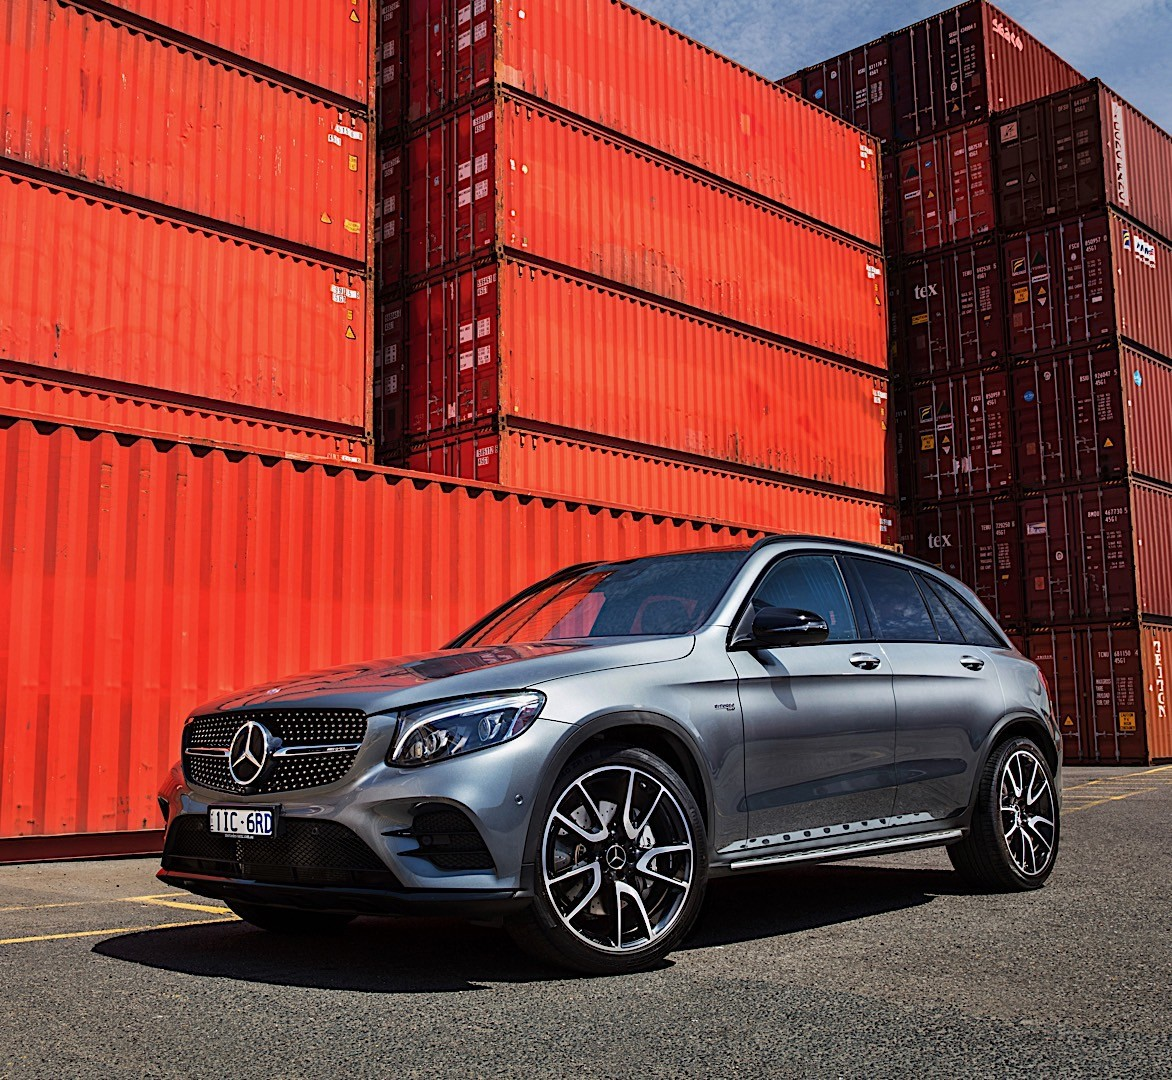 2019 Mercedes Benz Glc Coupe Camshaft: Mercedes-AMG GLC 43 (X253) Specs & Photos